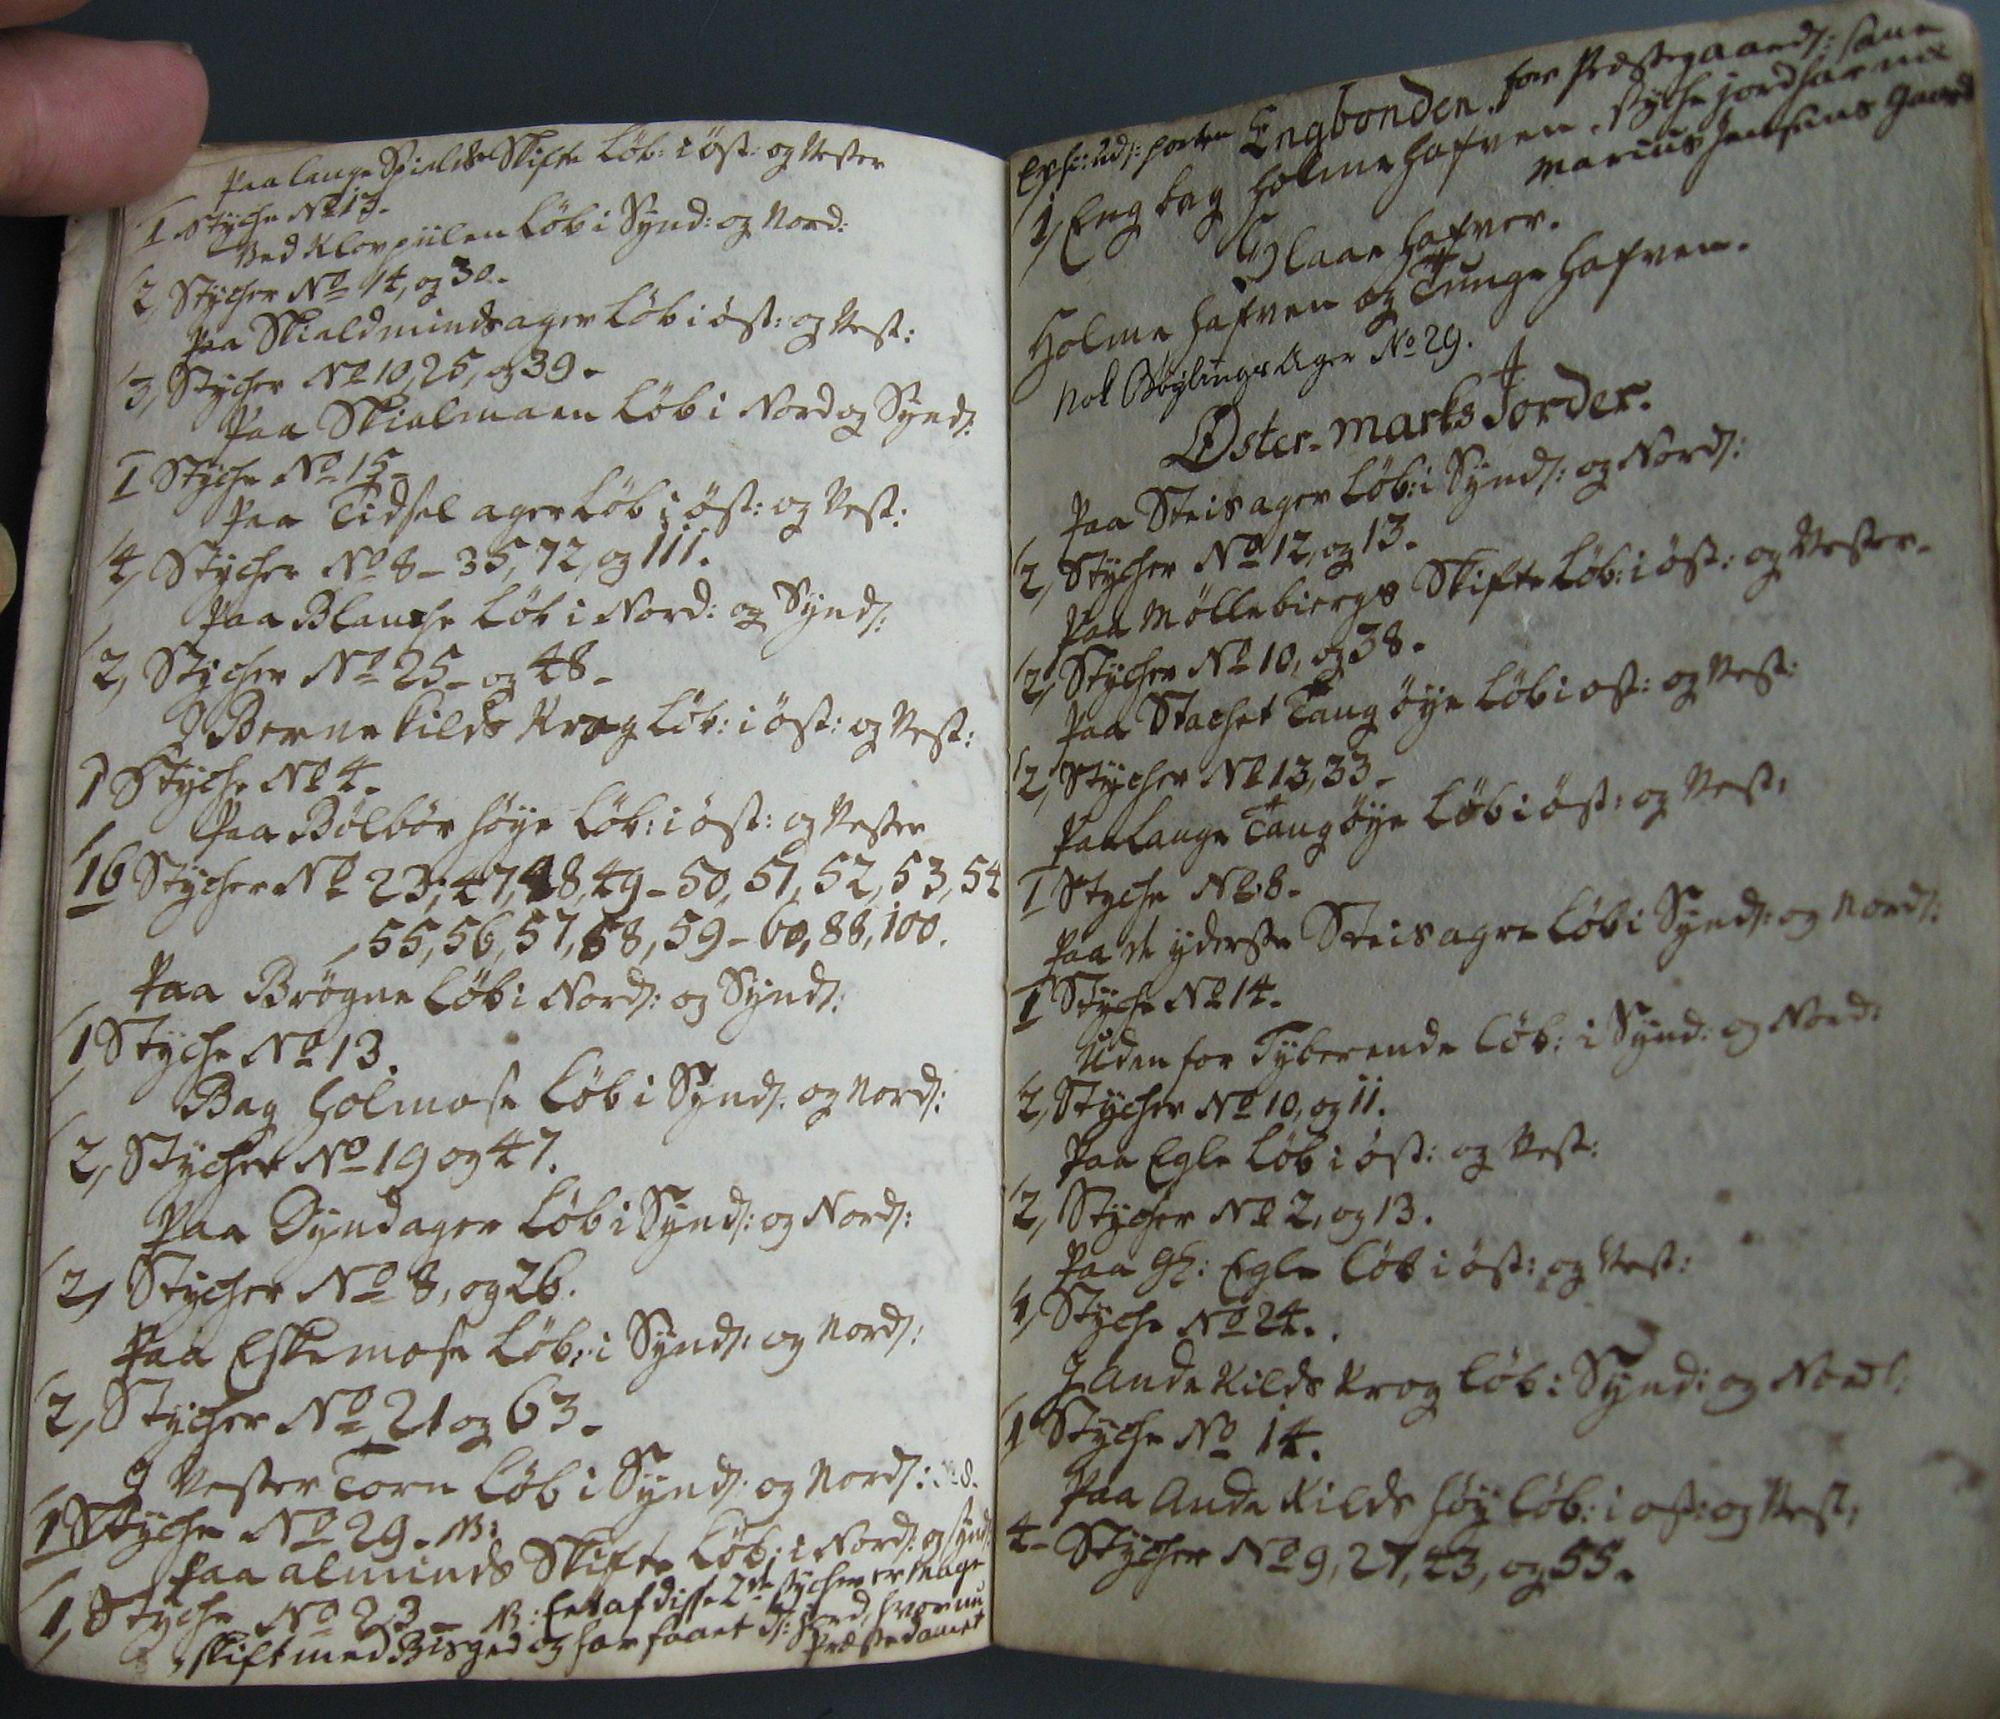 Lauritz Cruchow 1755 (20)